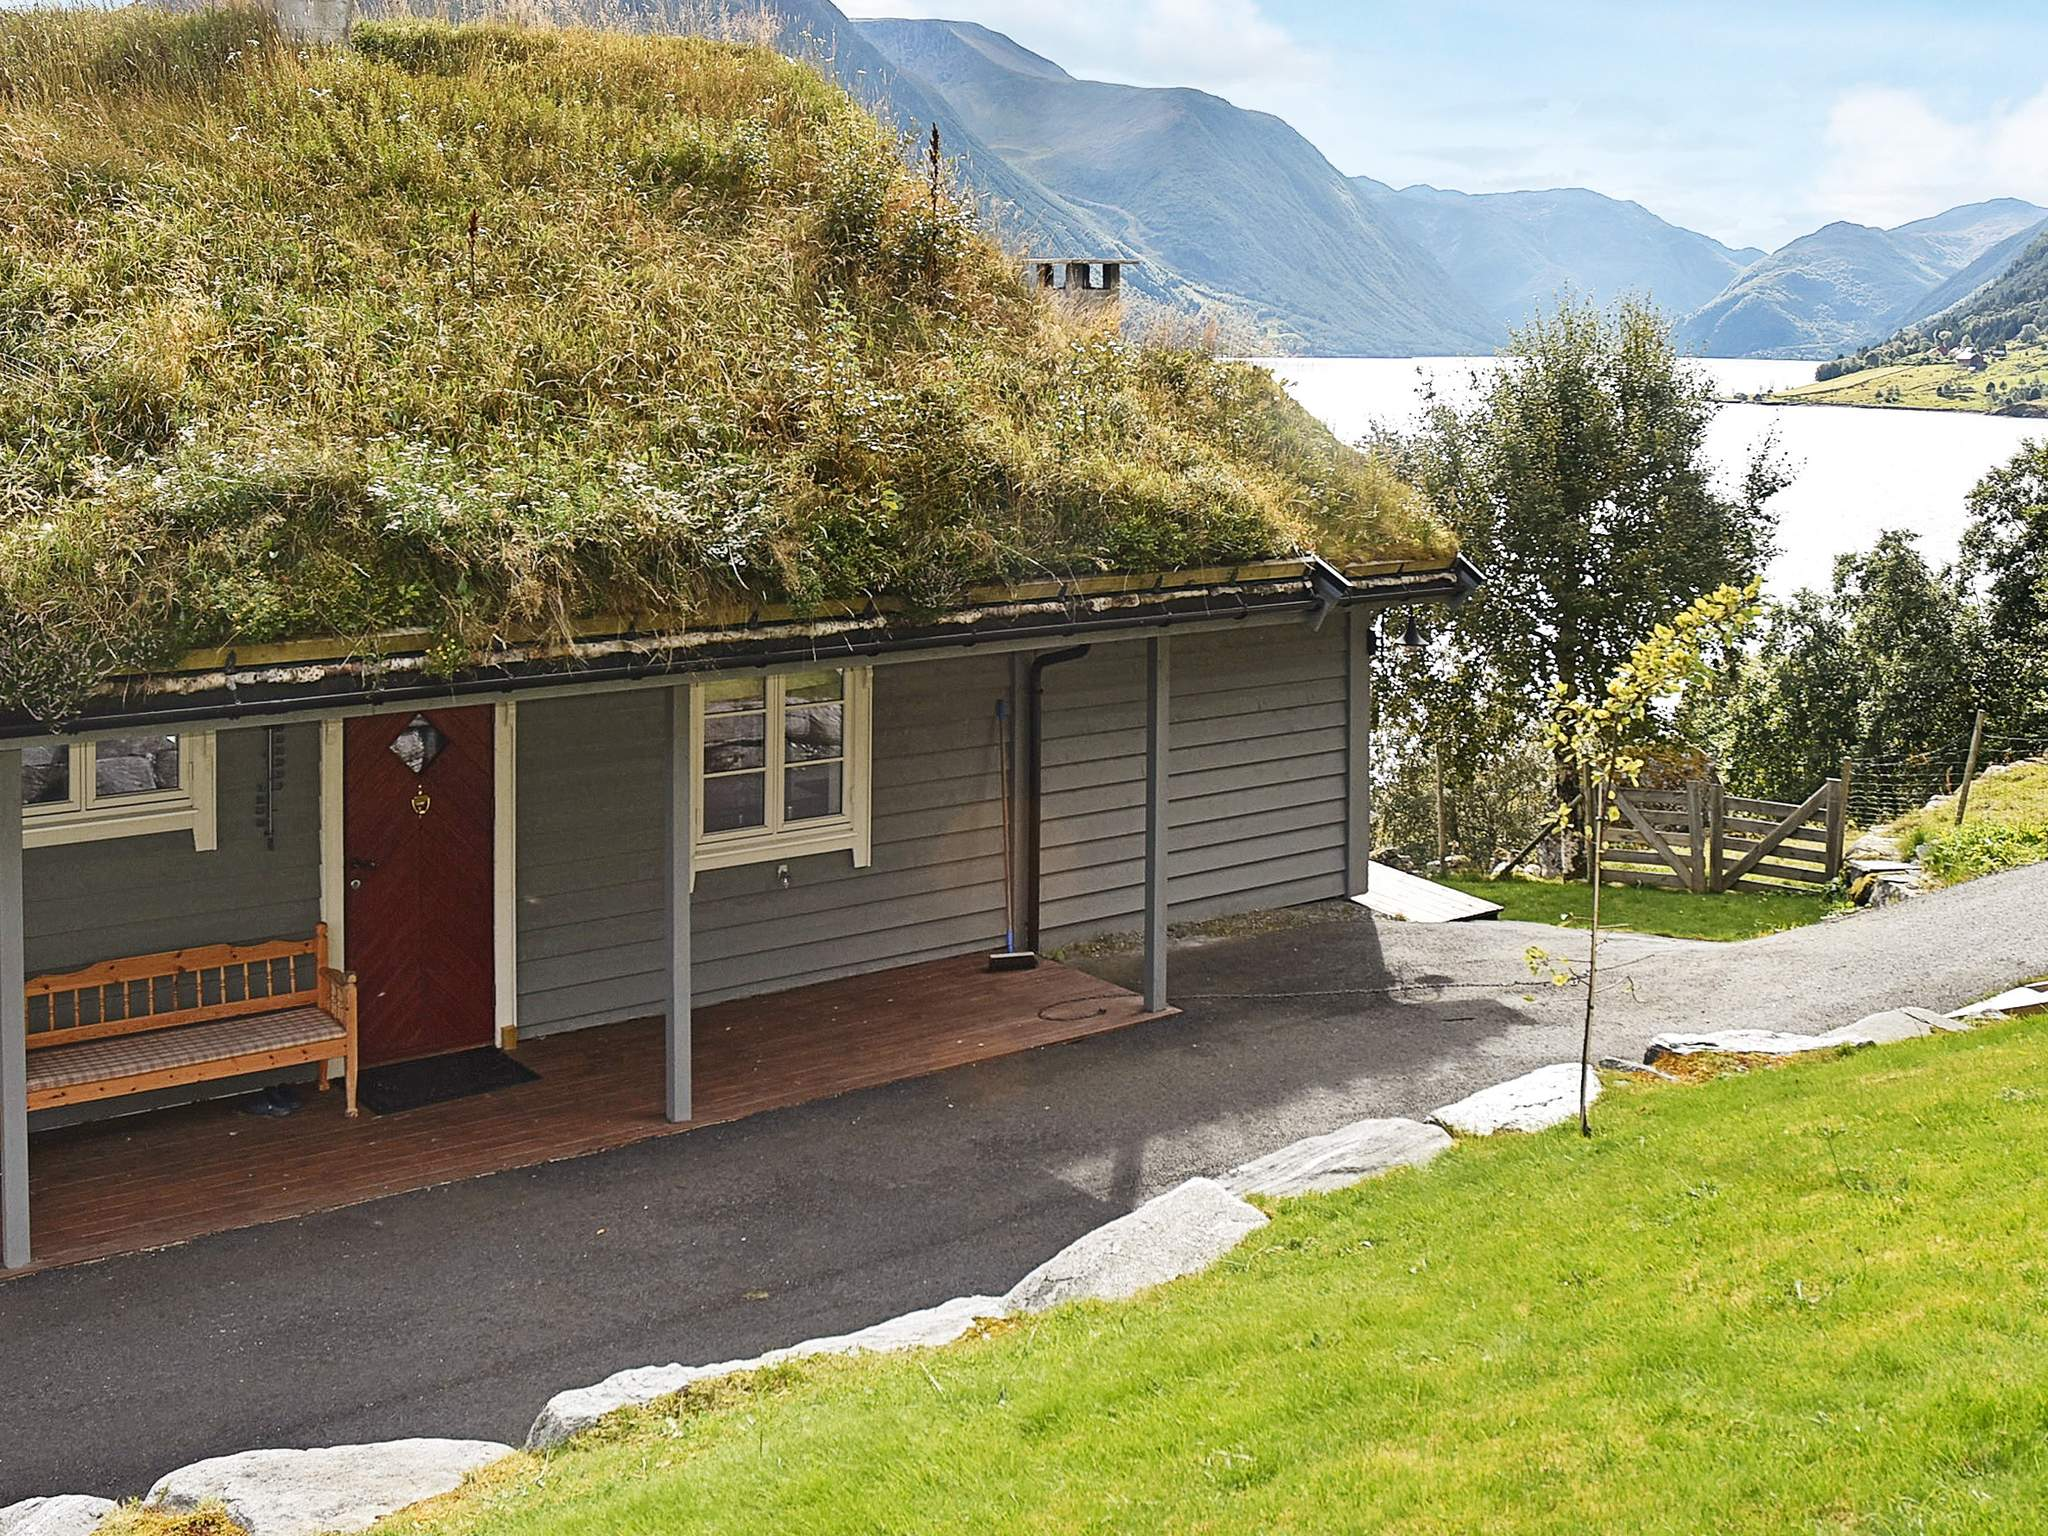 Ferienhaus Innselsetbygda (1043168), Lauvstad, More - Romsdal, Westnorwegen, Norwegen, Bild 25